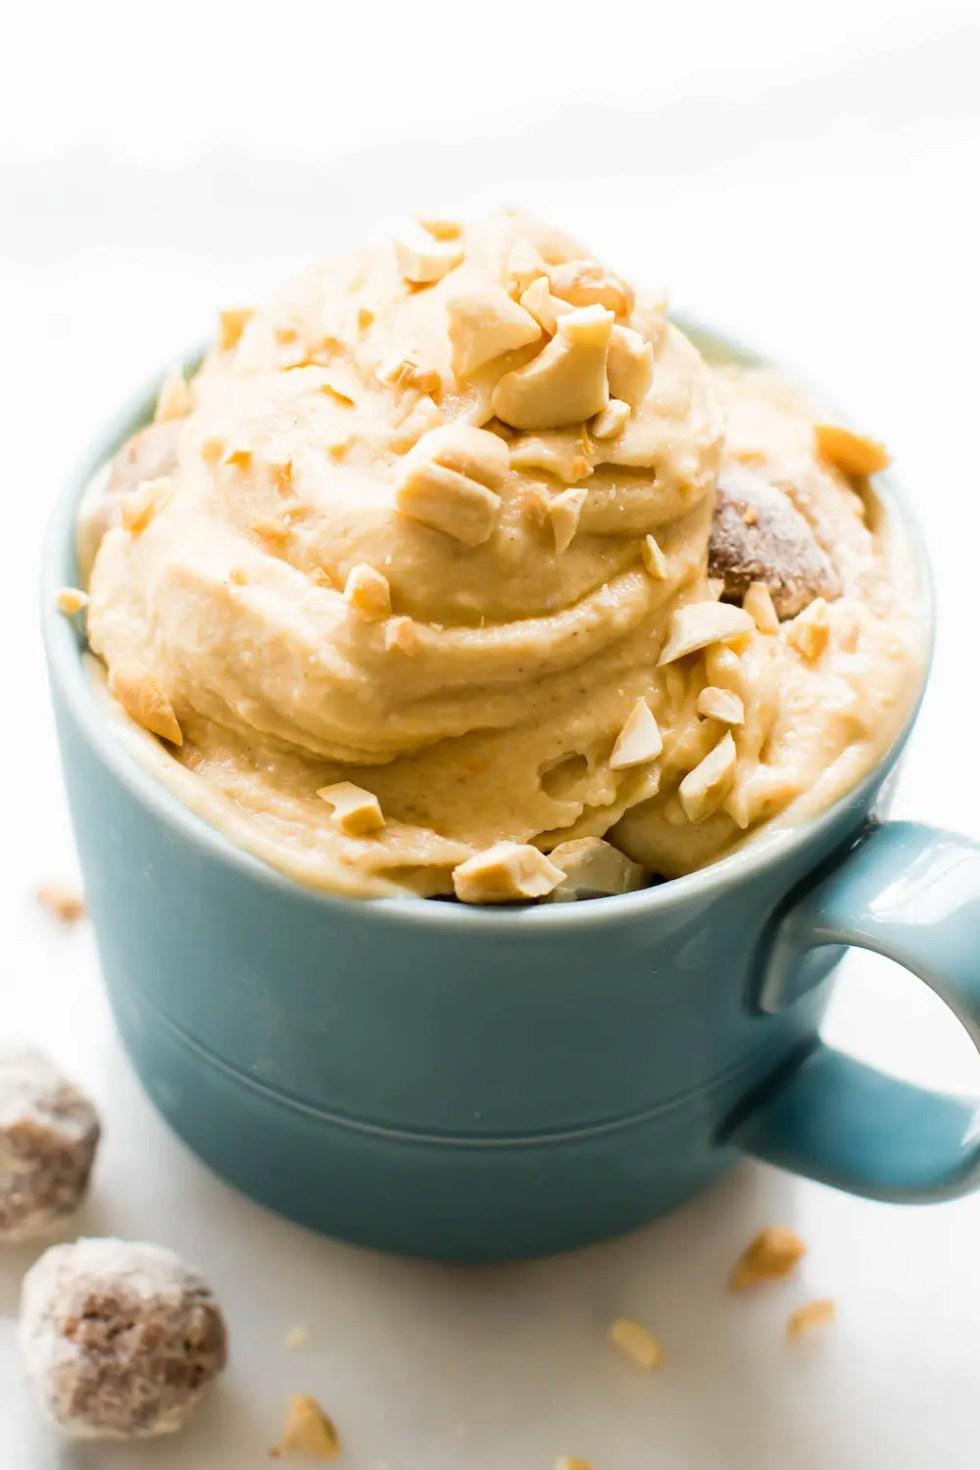 Chunky Peanut Butter Banana Ice Cream {vegan & gluten-free}